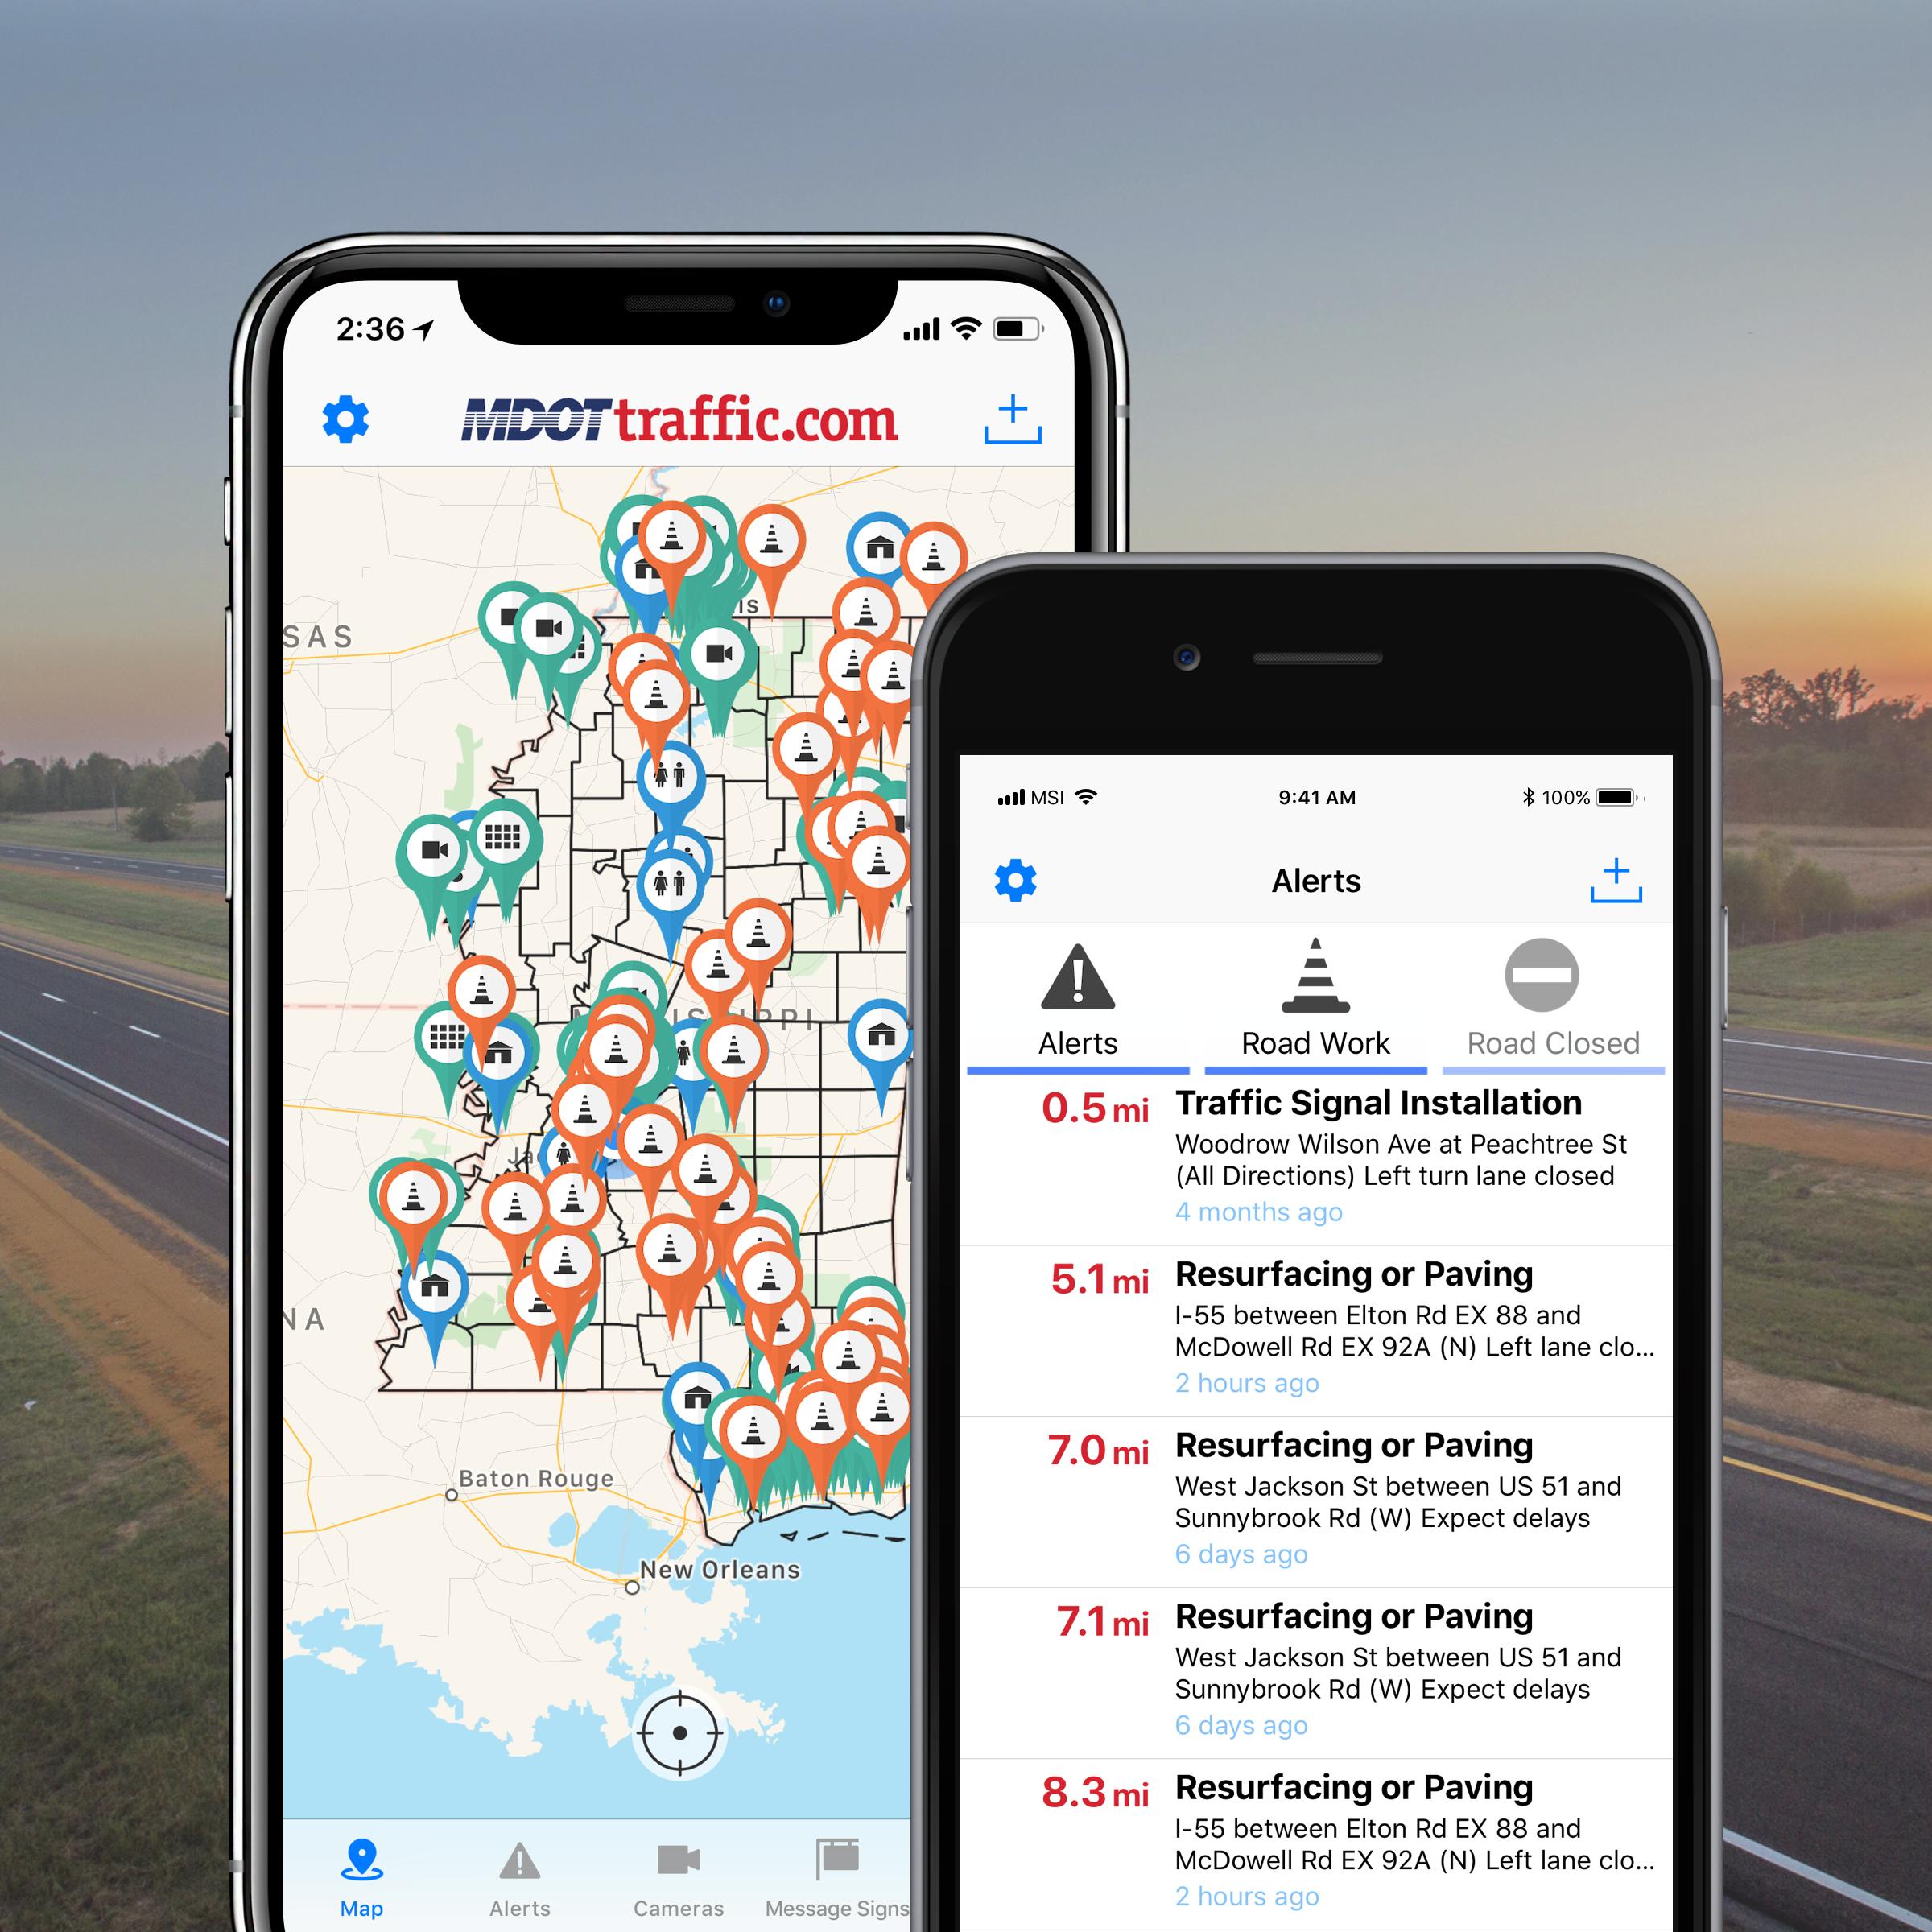 image of MS Department of Transportation  Wins 2018 Outstanding Mobile Application Mobile WebAward for MDOT Traffic Mobile App